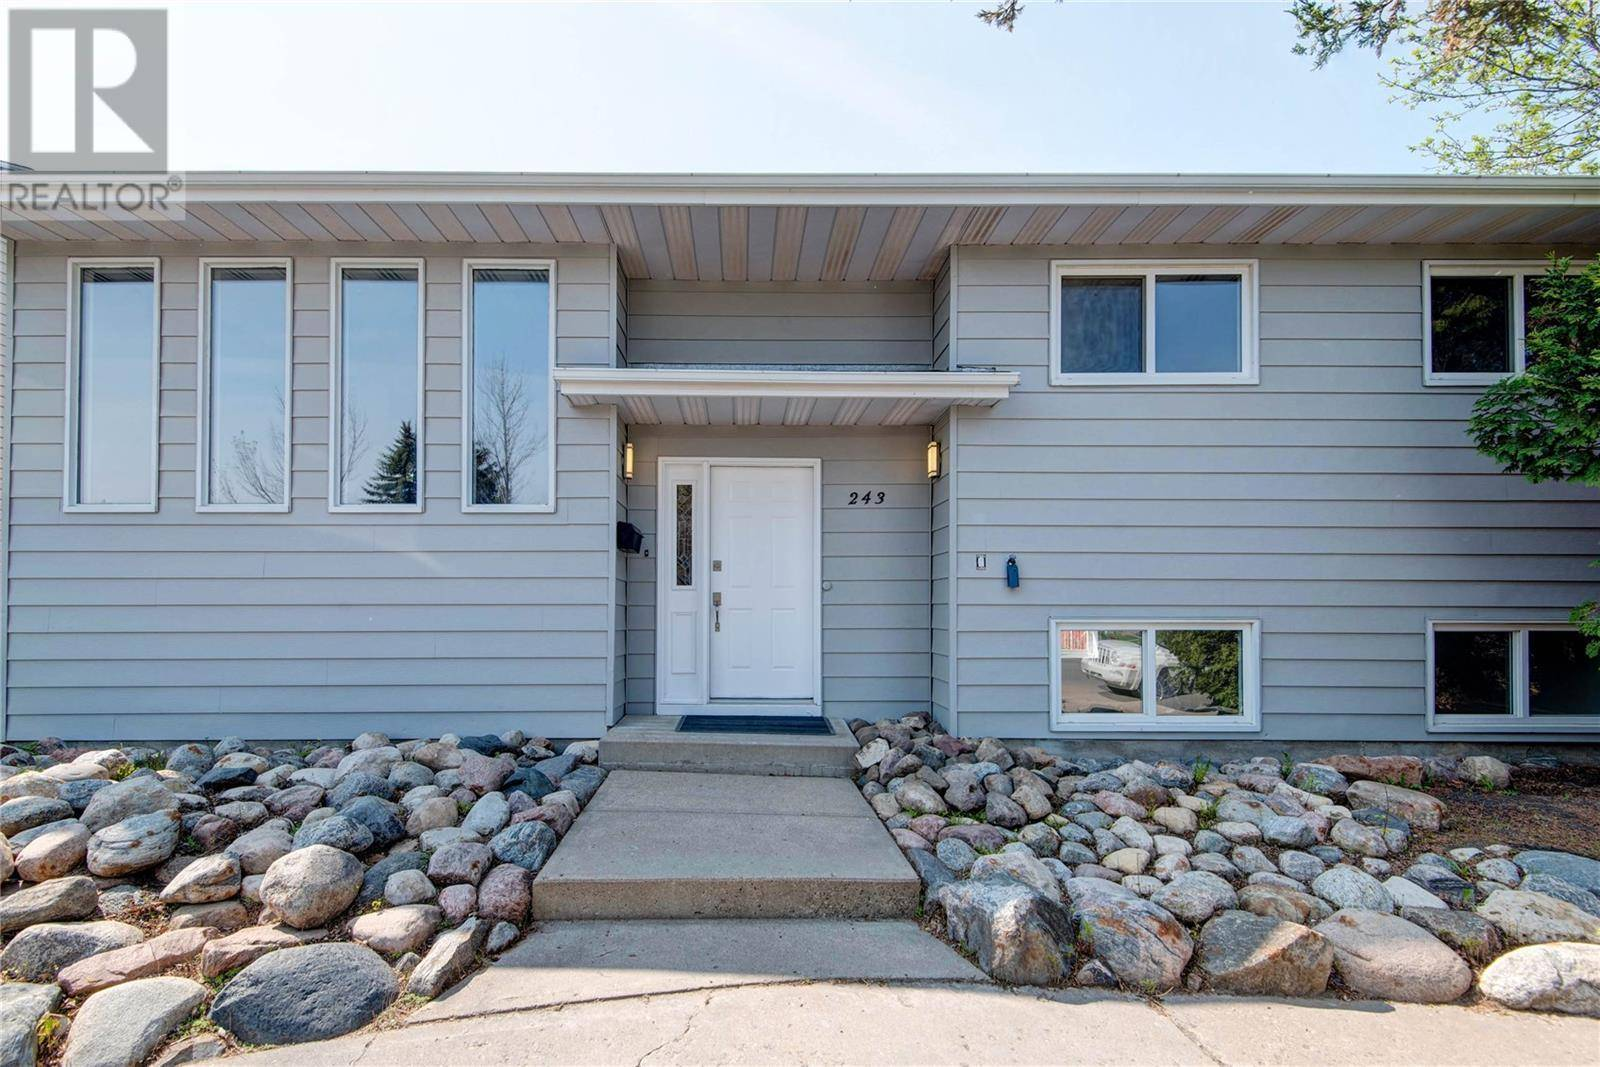 House for sale at 243 Meilicke Rd Saskatoon Saskatchewan - MLS: SK778618